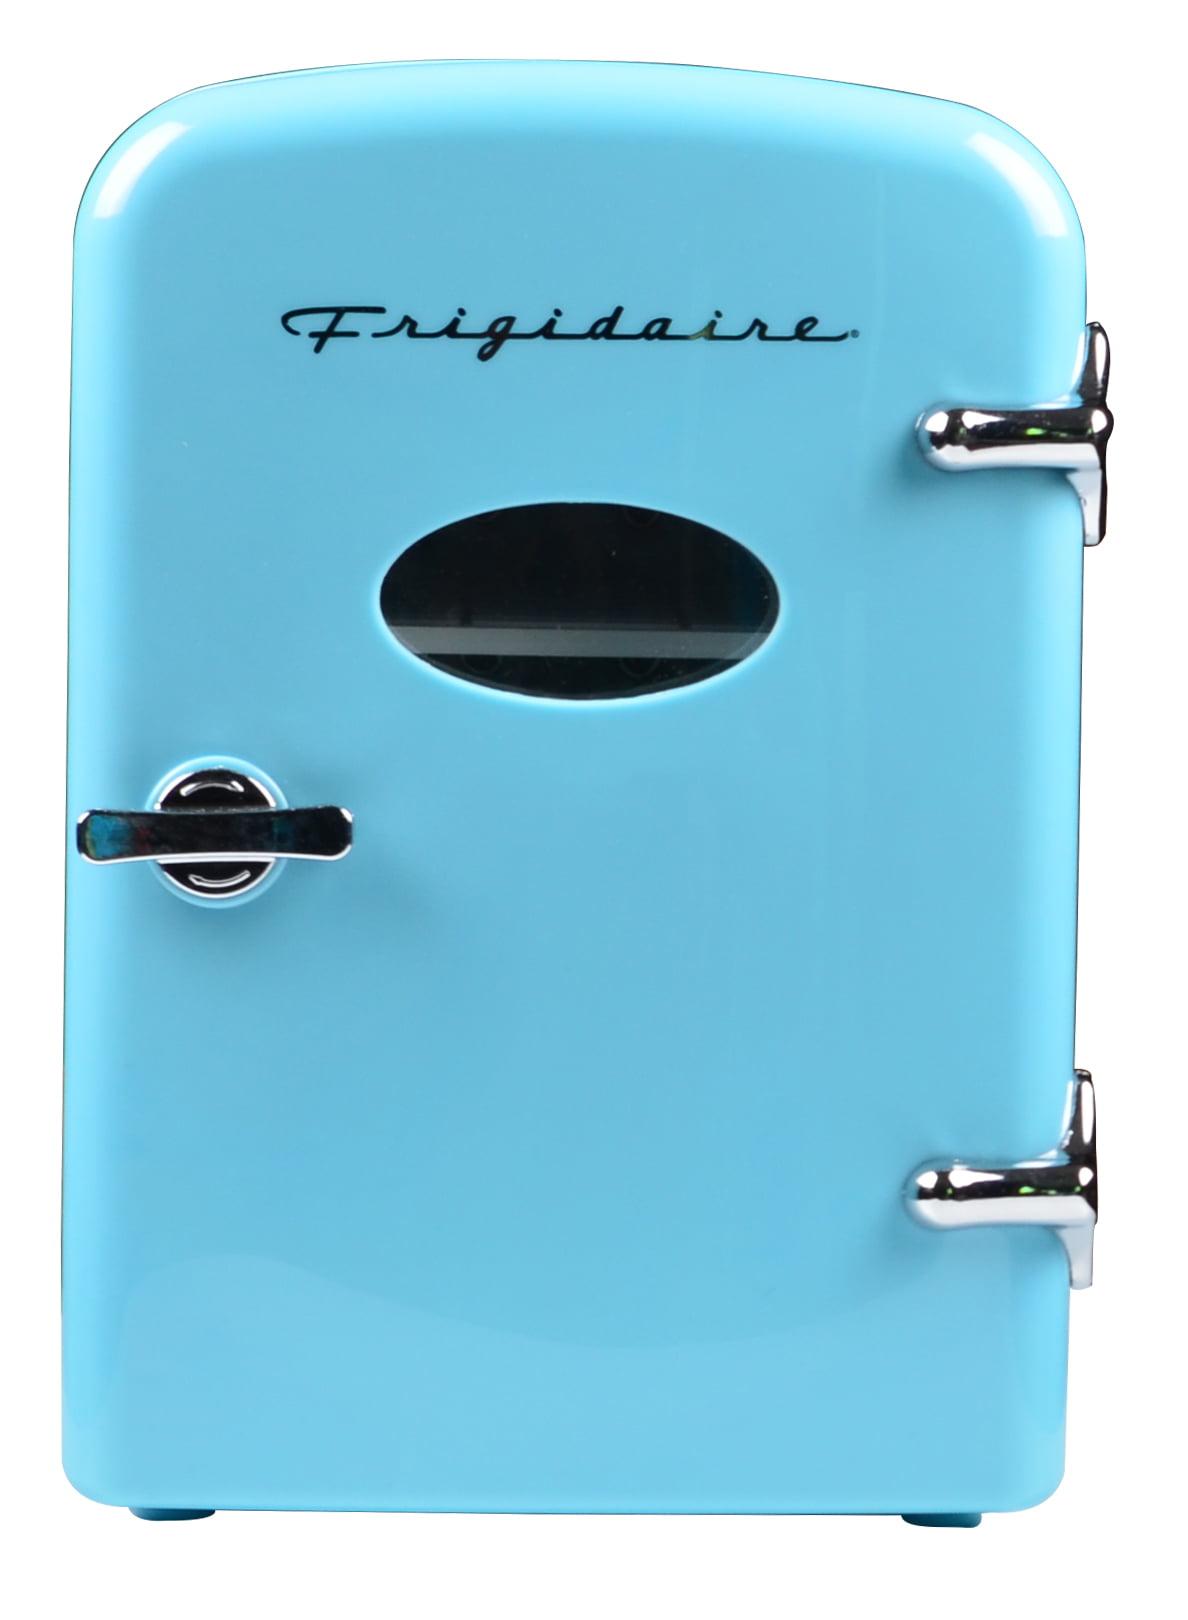 Frigidaire Portable Retro 6 Can Mini Fridge Efmis129 Blue Walmart Com Walmart Com